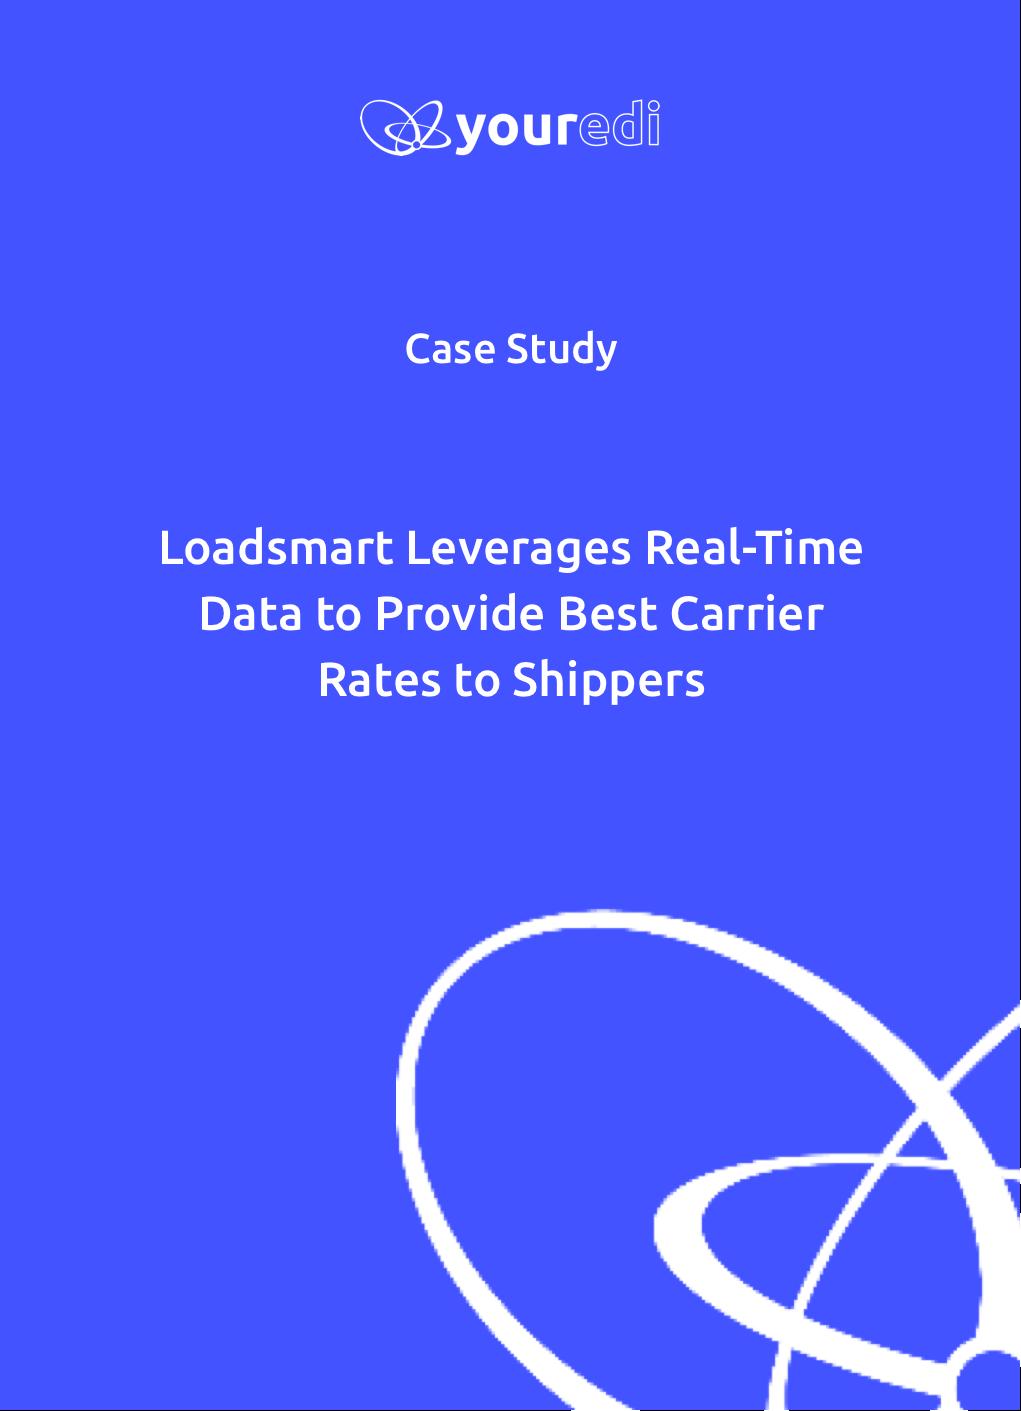 Loadsmart Case Study Resource Image